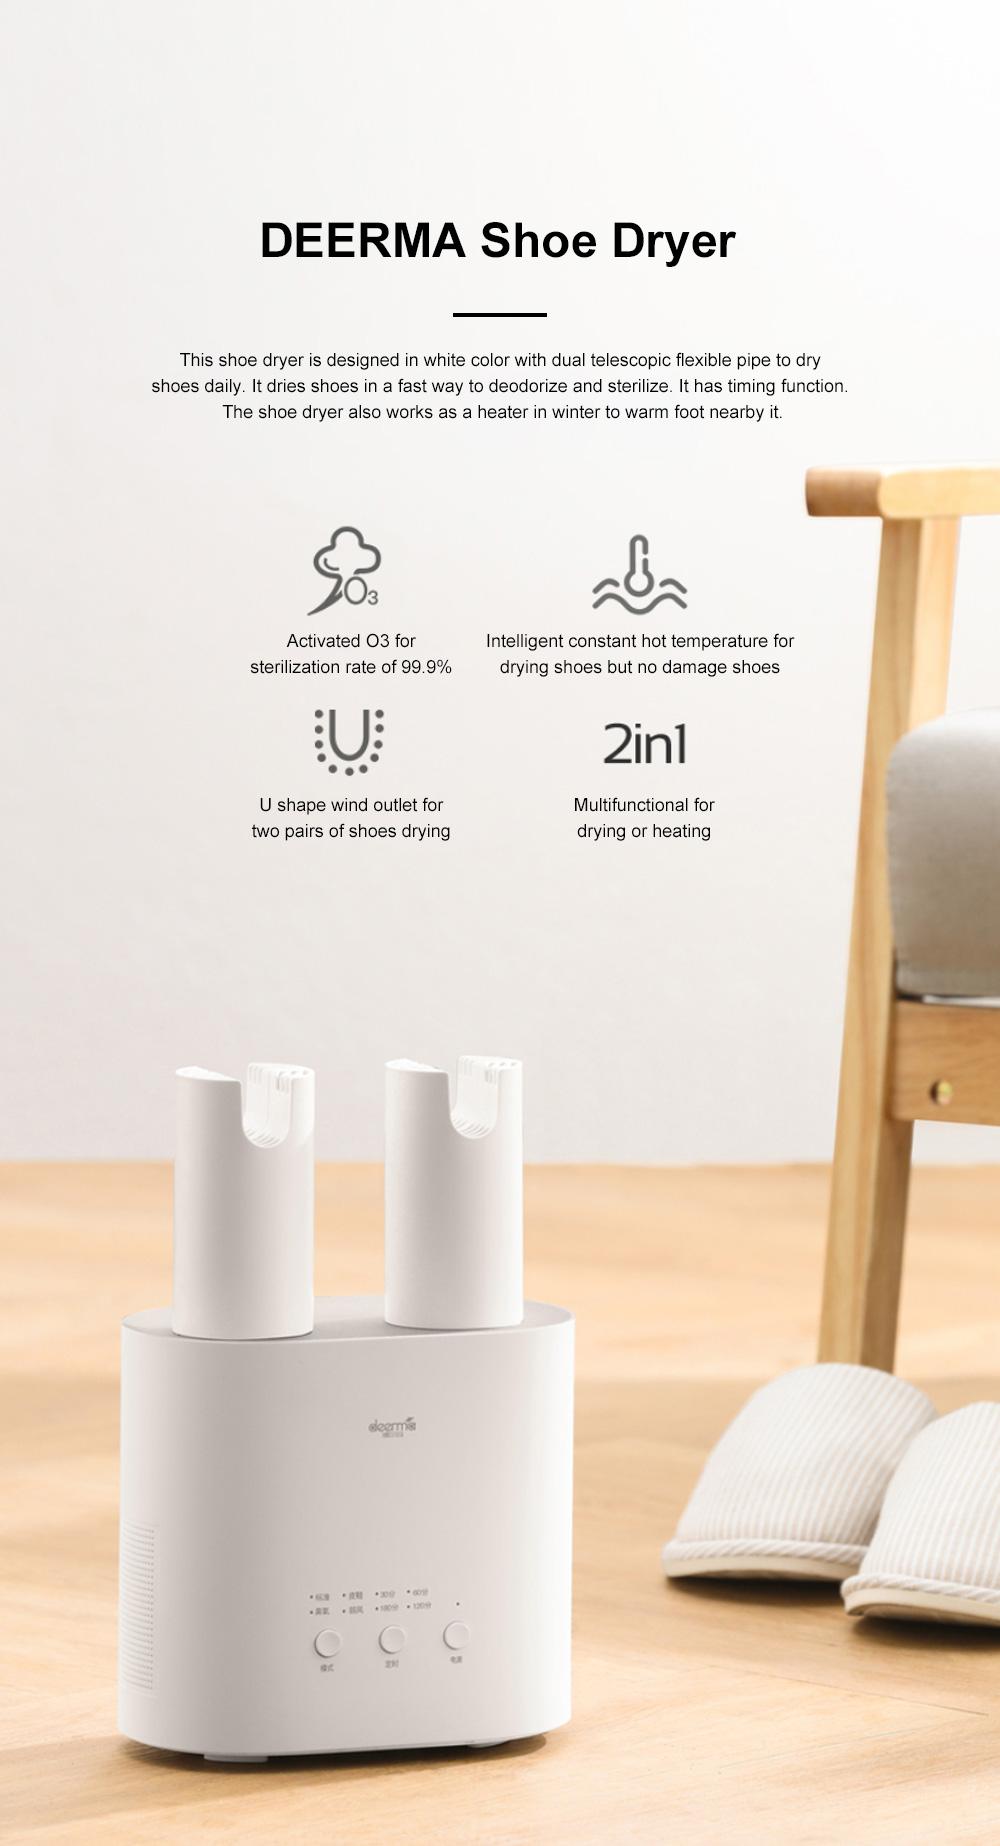 DEERMA Multiple-effect Shoe Dryer for Family Use Deodorizing and Sterilizing Drying Machine Multifunctional Telescopic Shoe Dryer 0